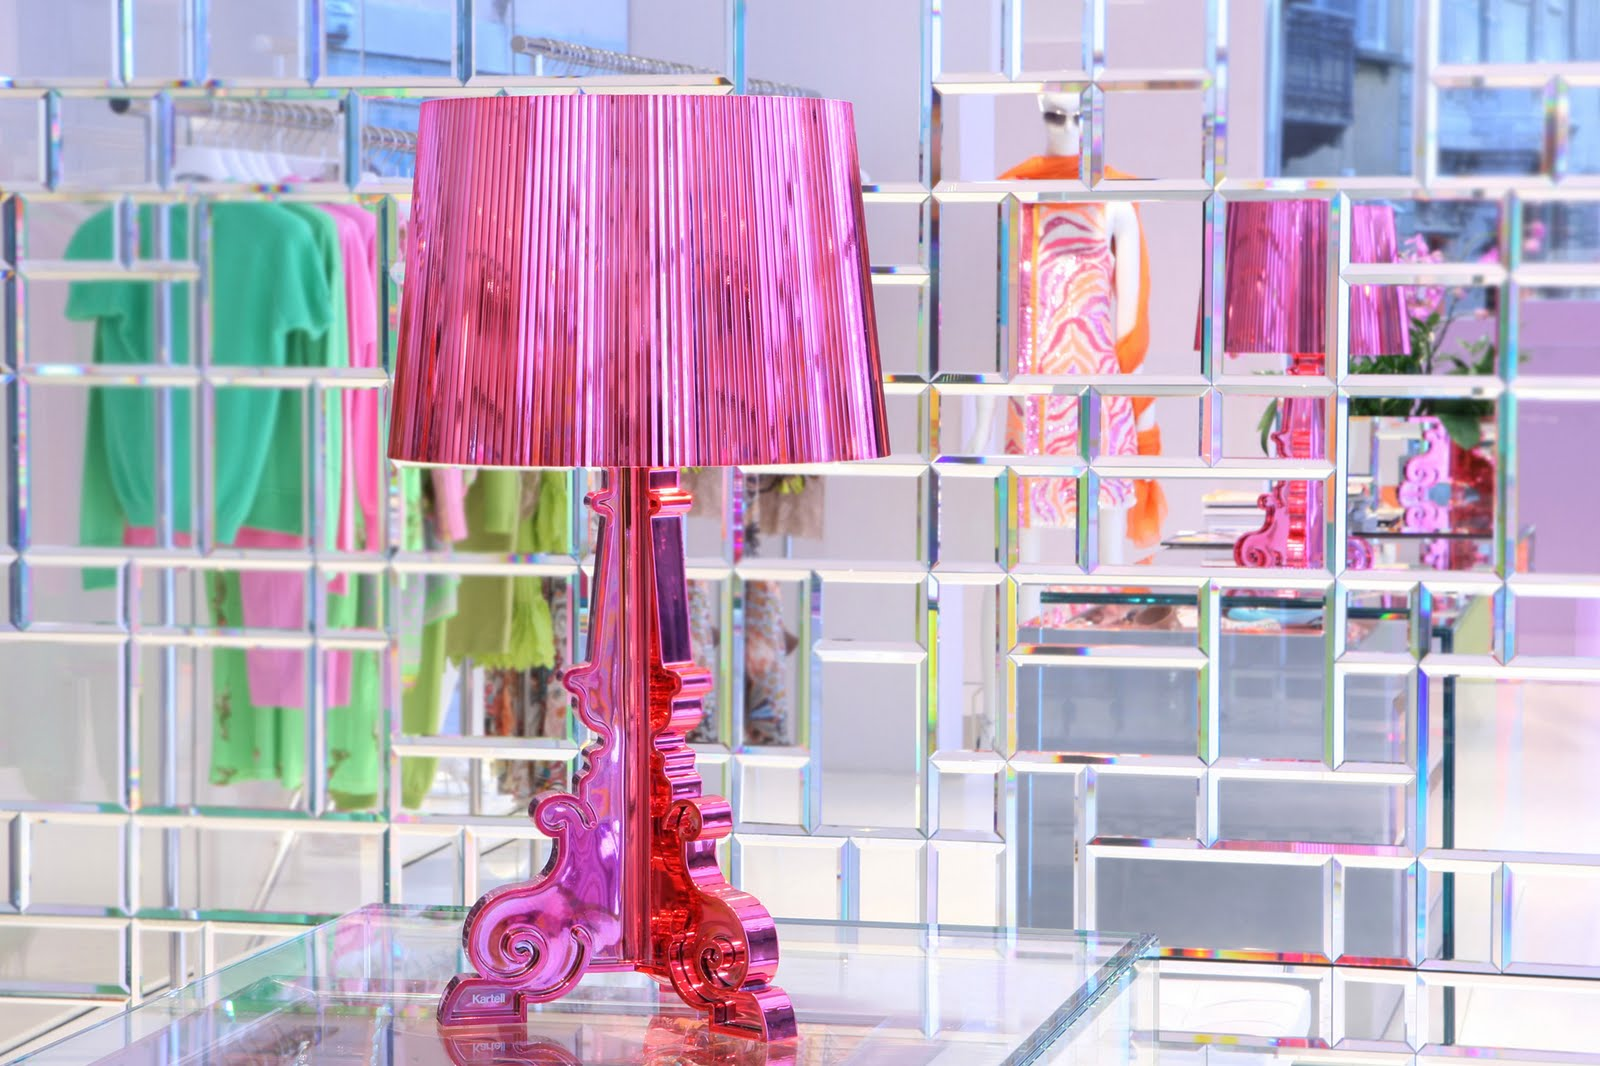 Modern Design By Moderndesign.org